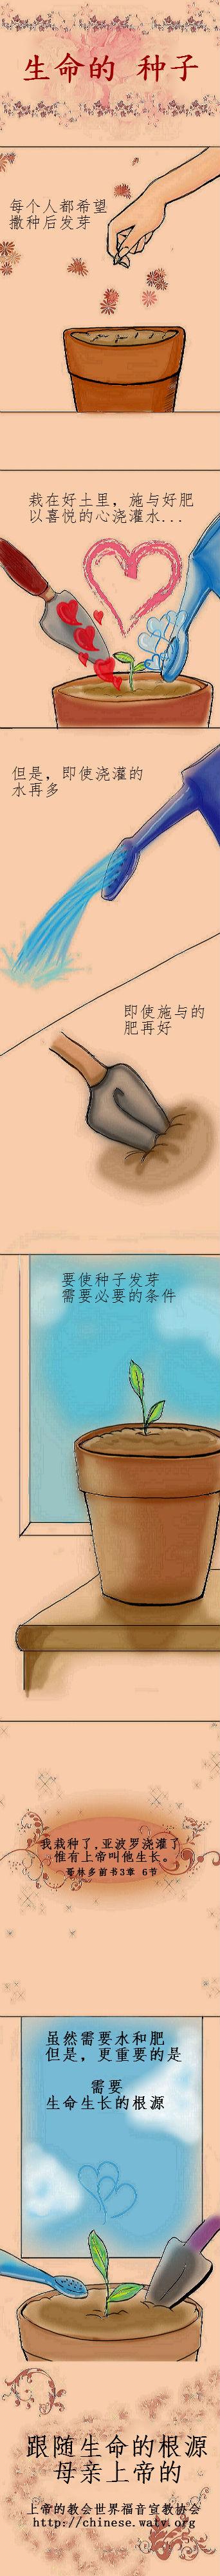 20130605_162540